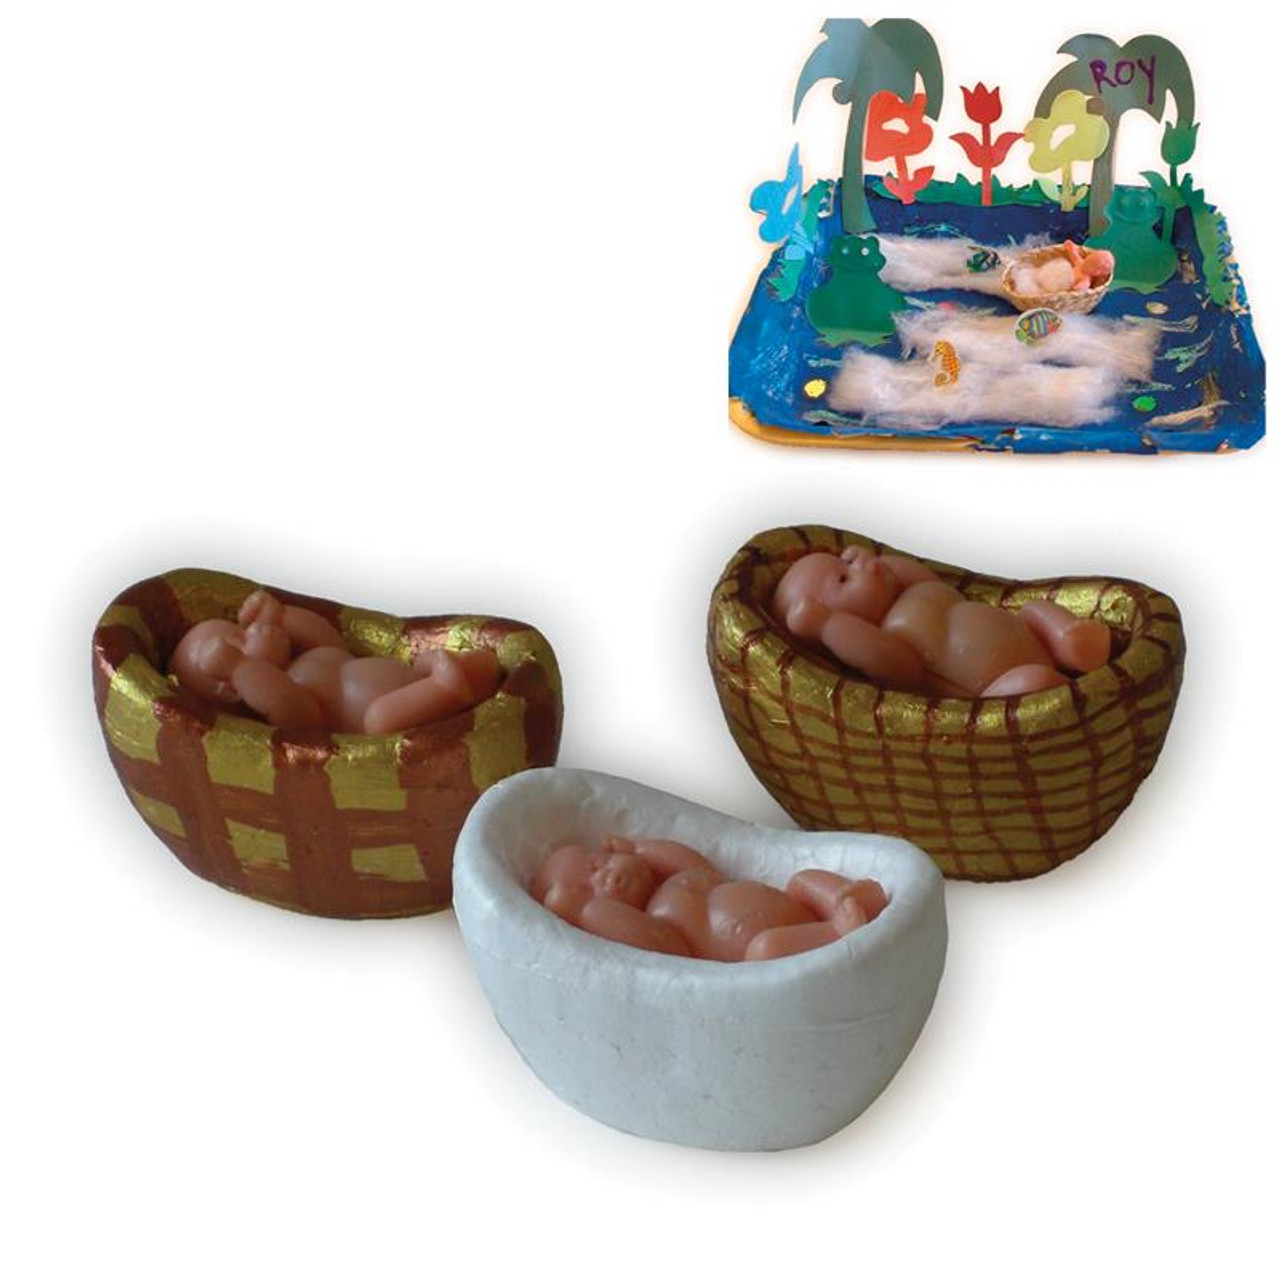 Baby Art Project Ideas